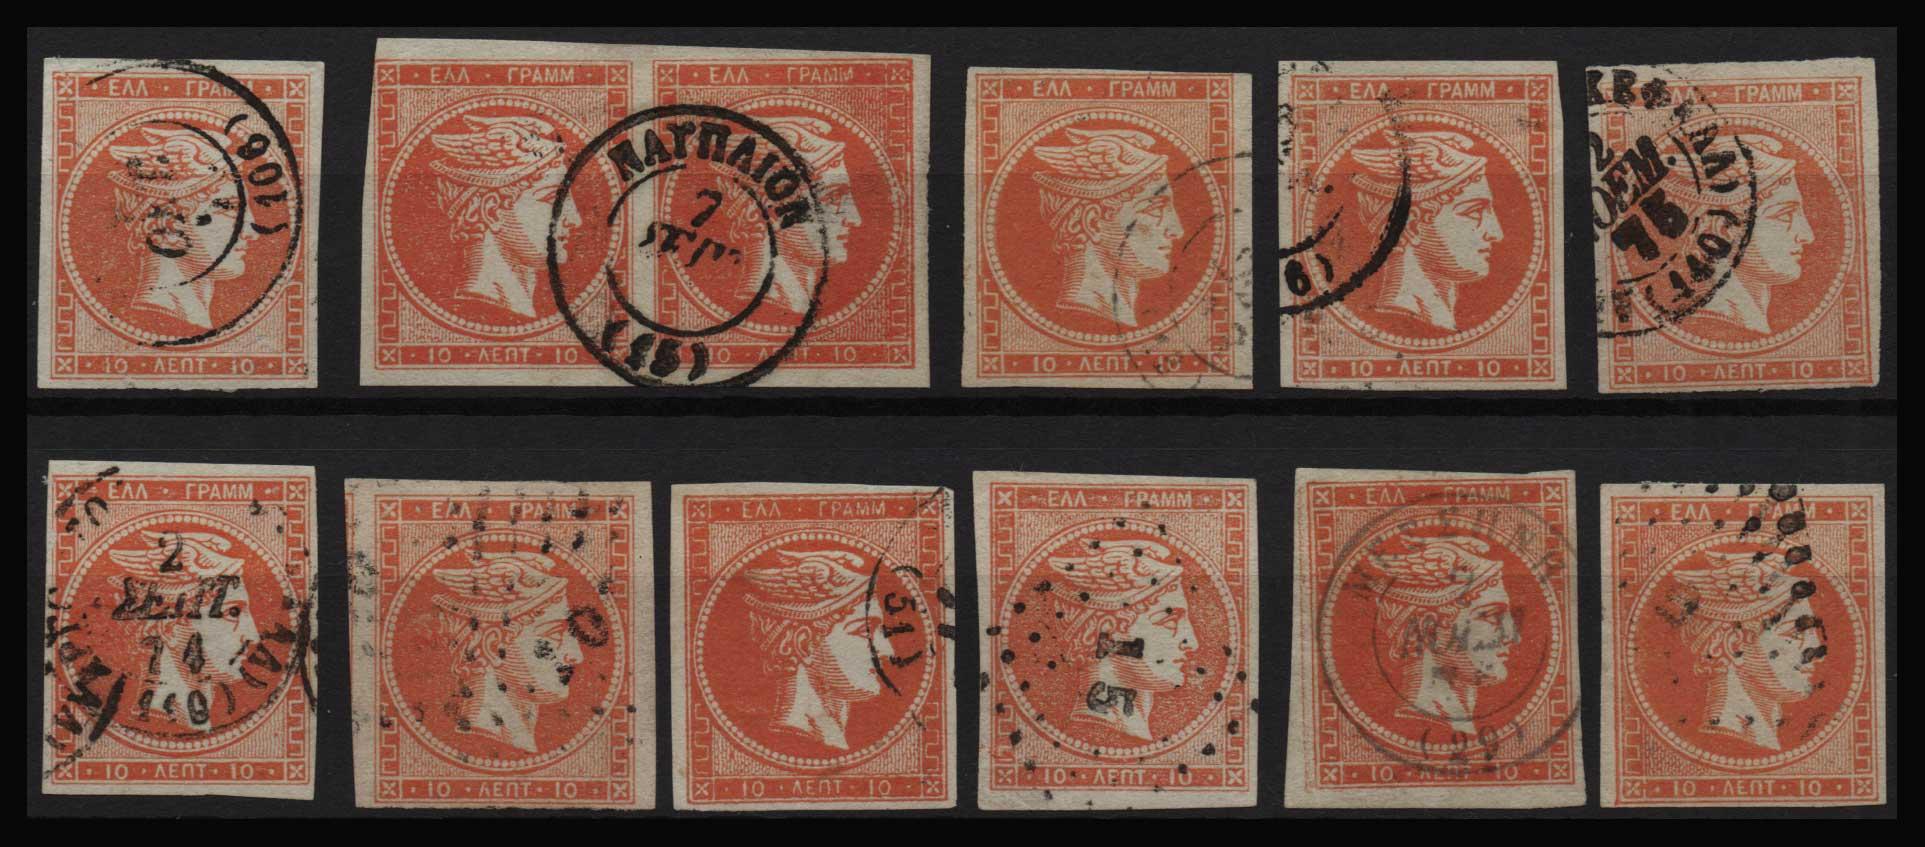 Lot 44 - -  LARGE HERMES HEAD large hermes head -  Athens Auctions Public Auction 89 General Stamp Sale